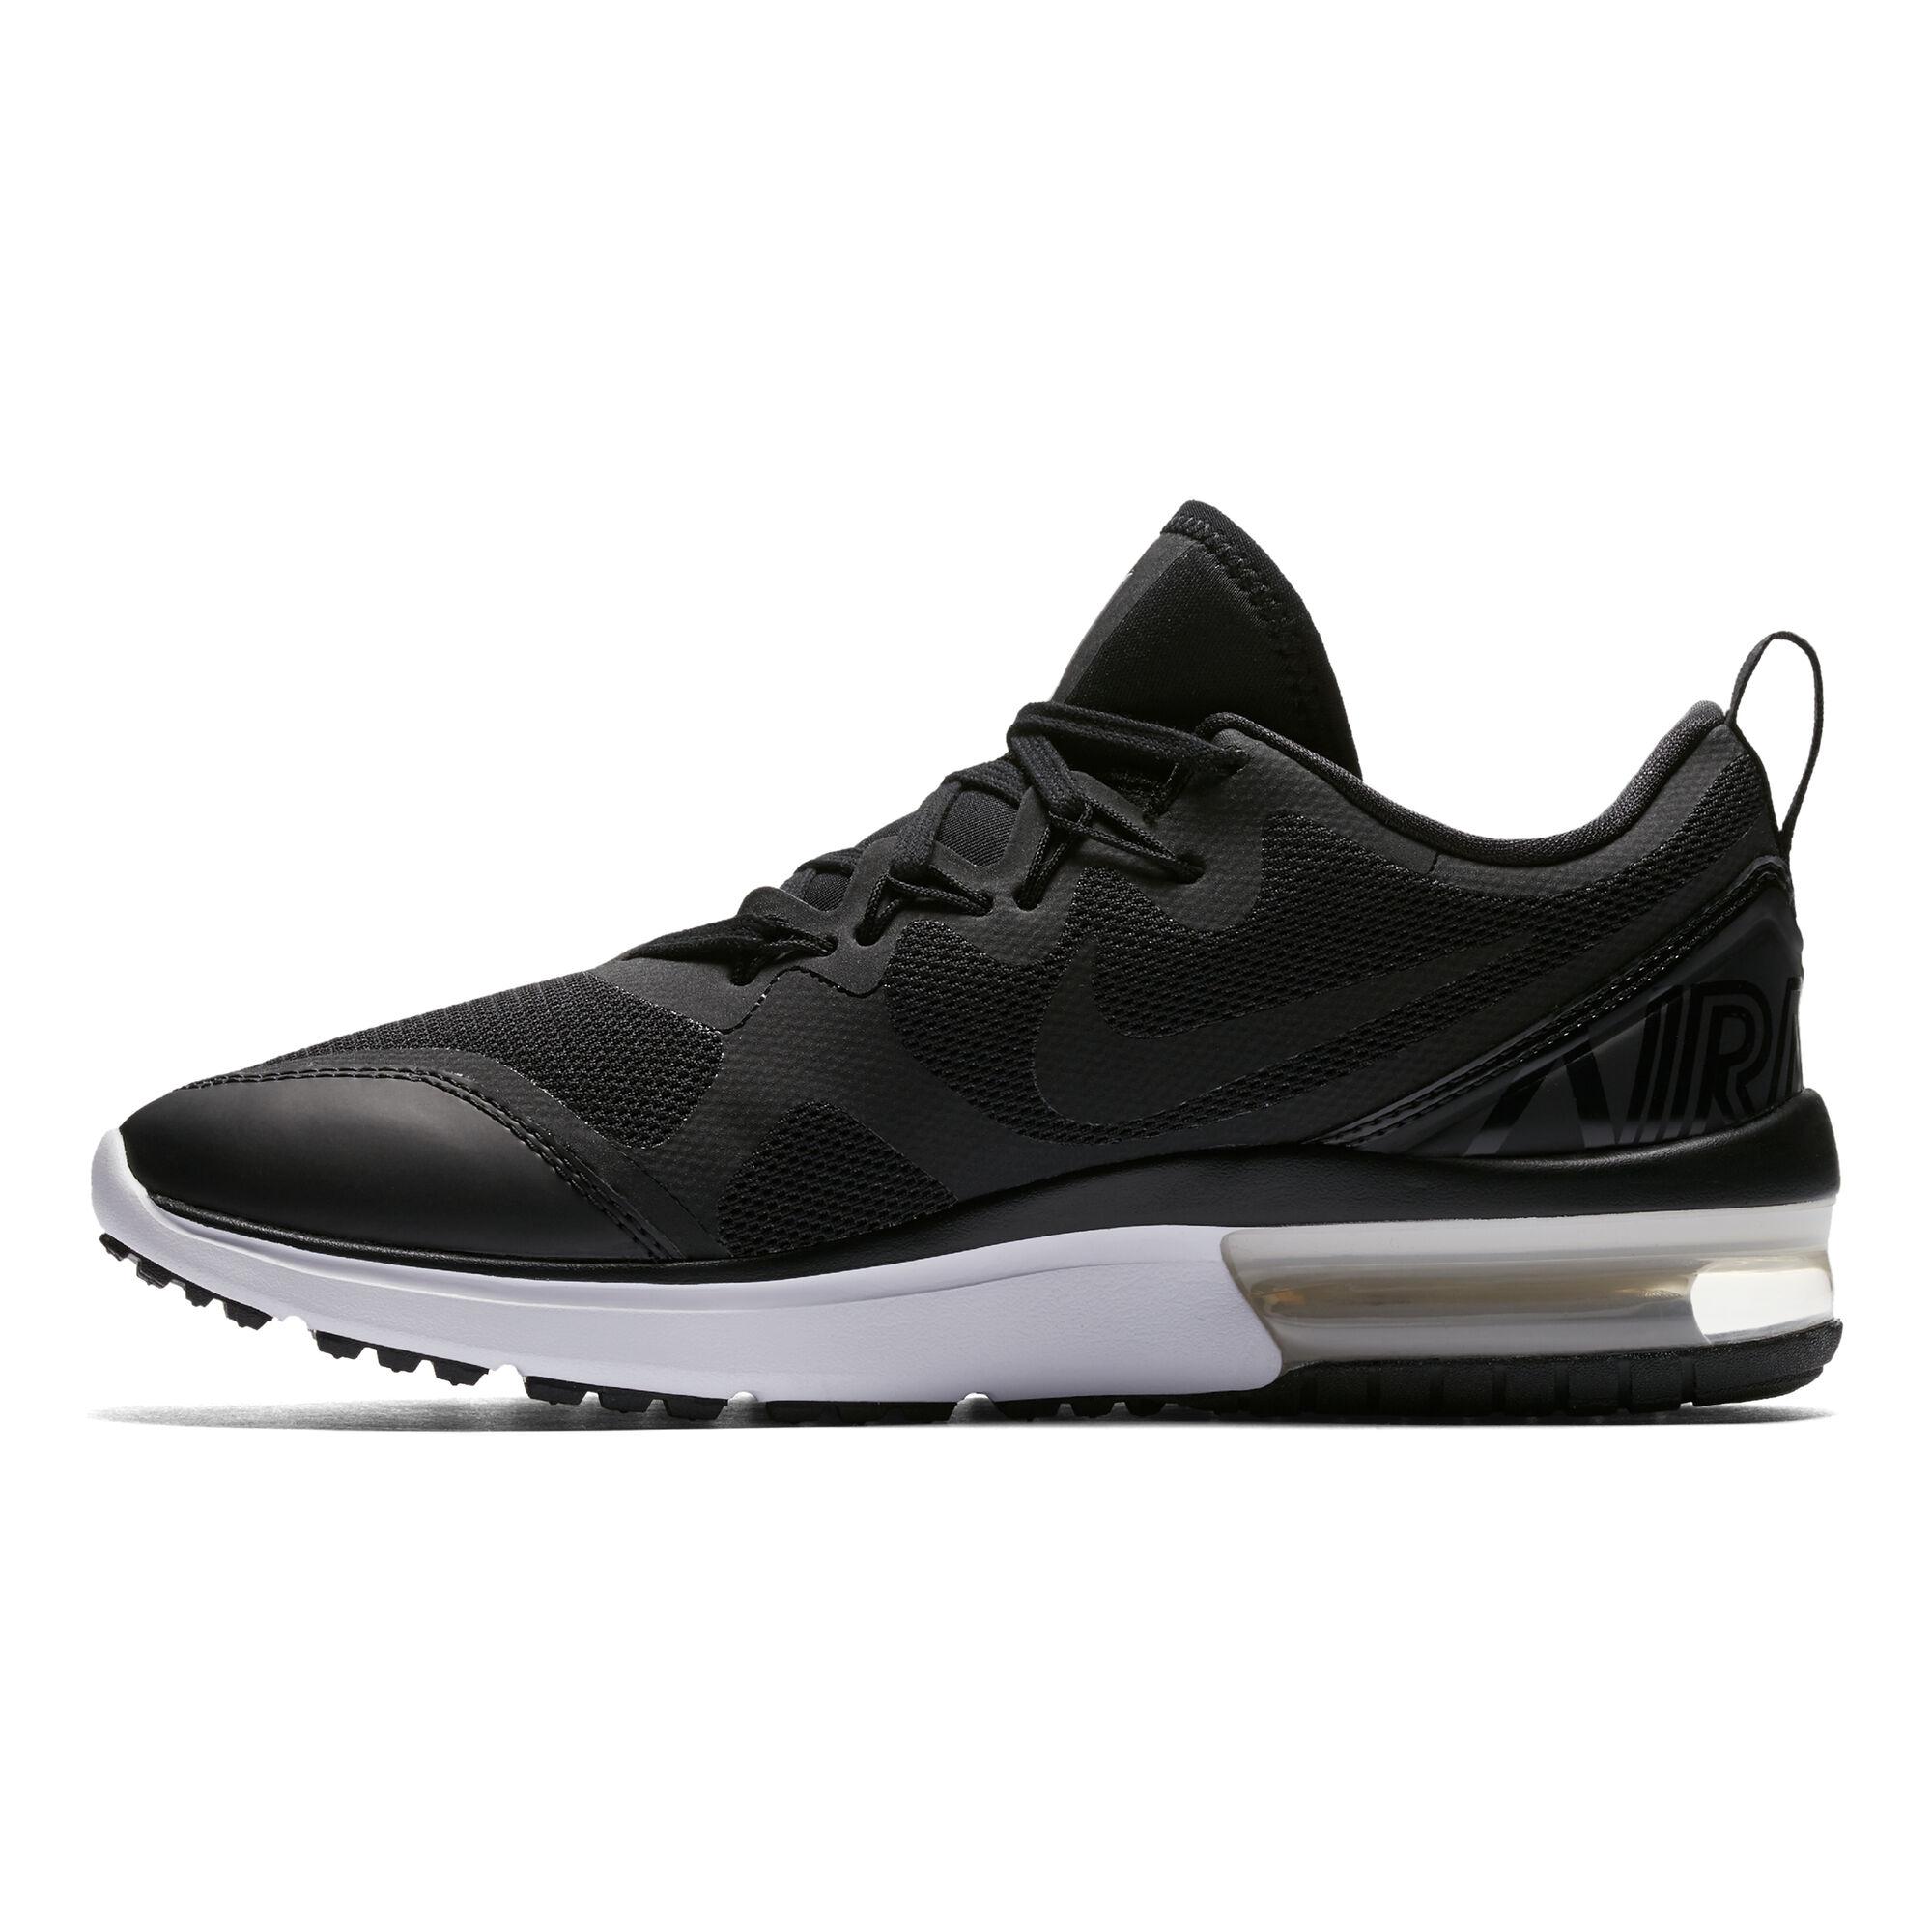 08c5fa9d691 buy Nike Air Max Fury Neutral Running Shoe Women - Black